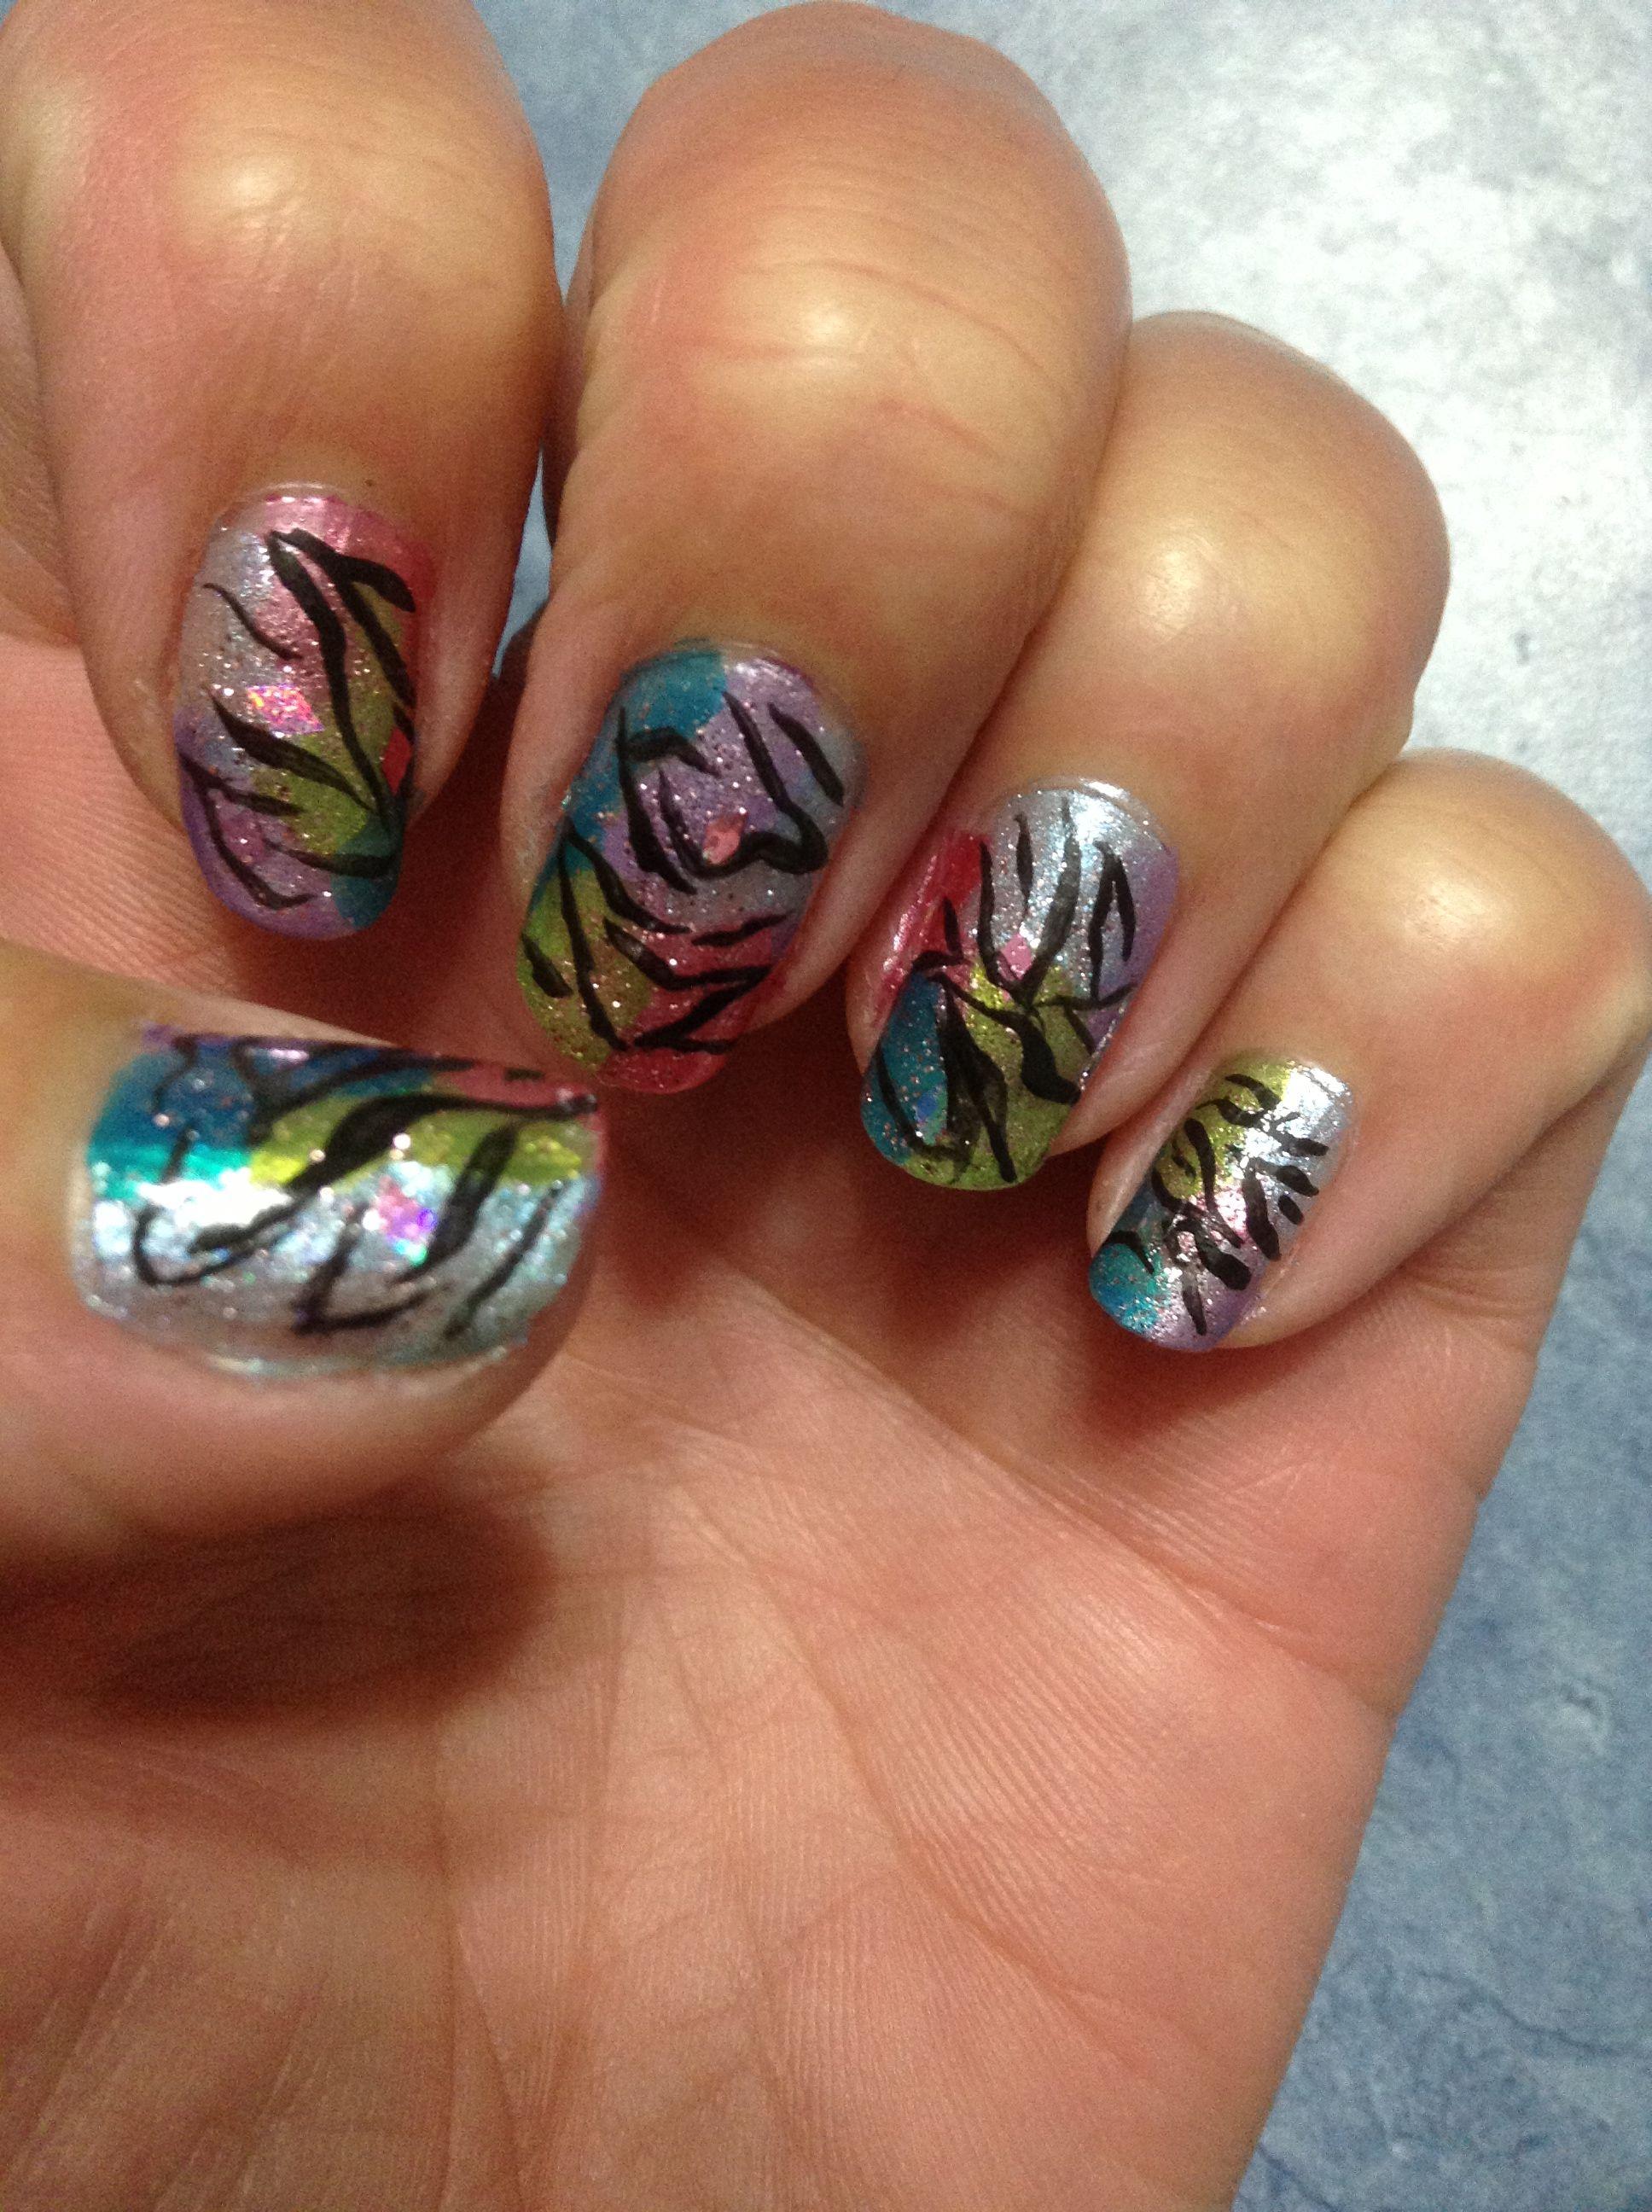 Colourful Zebra Patterned Nails. :)